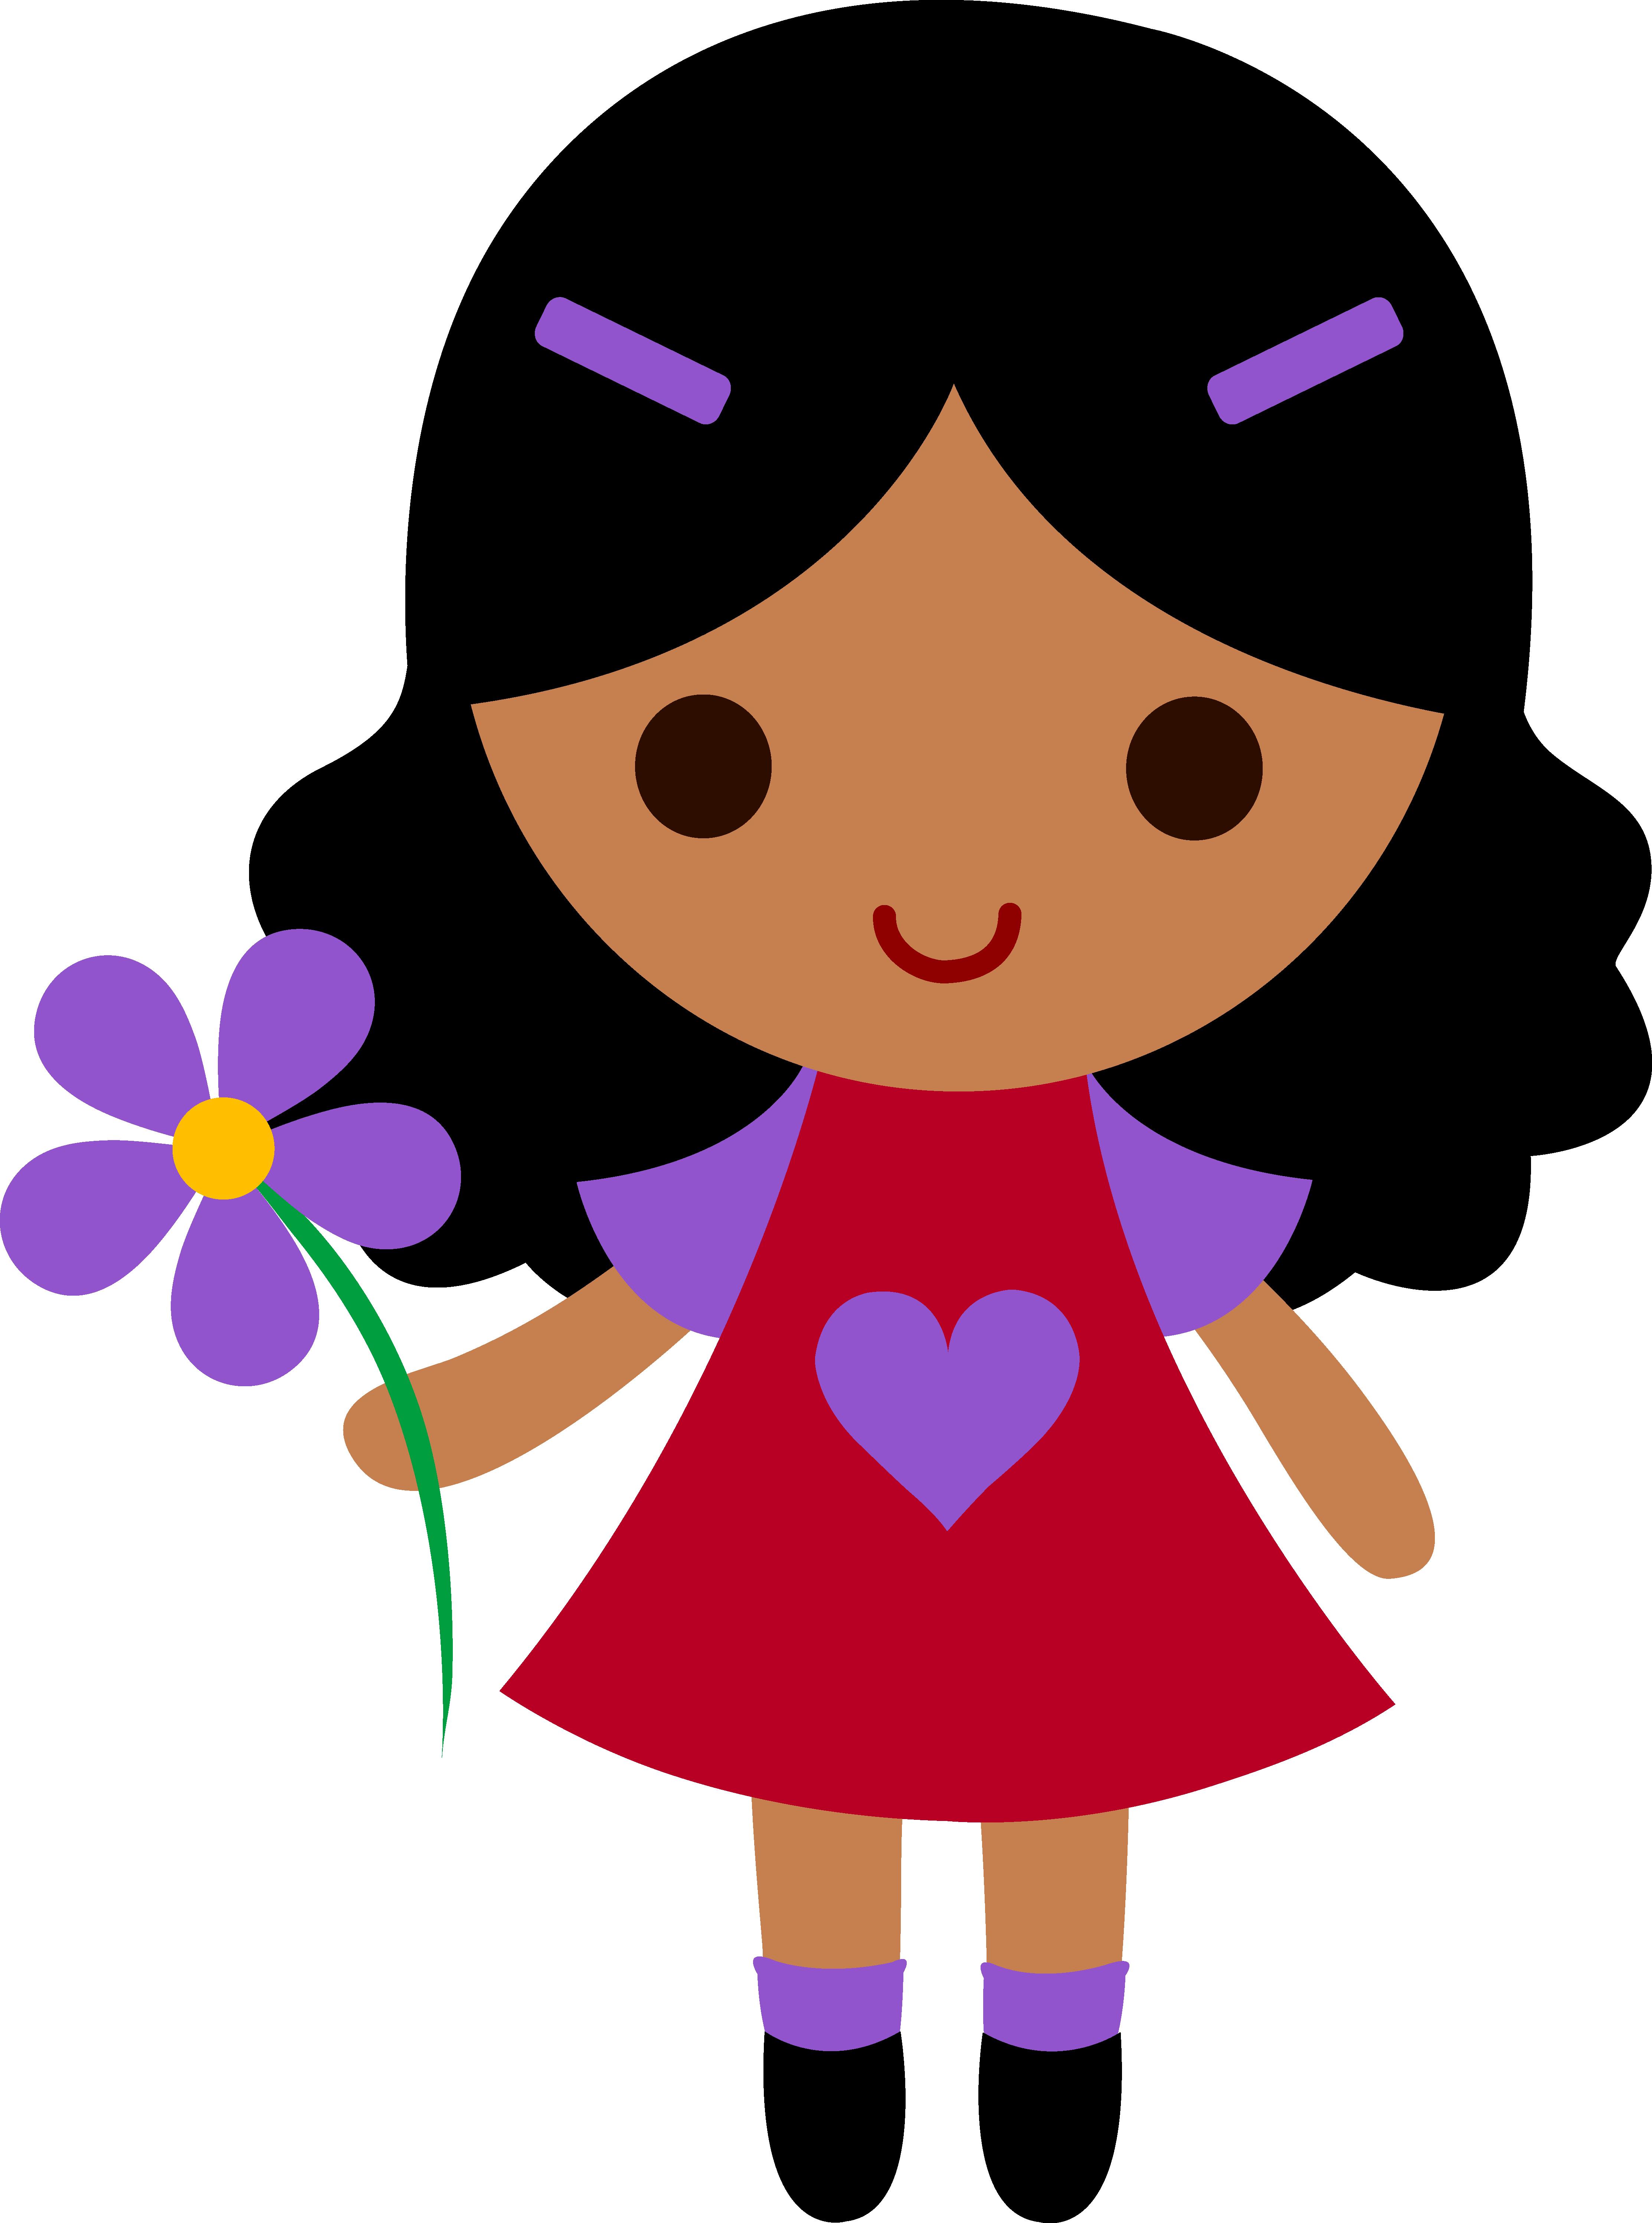 My clip art of a little girl holding a purple flower.